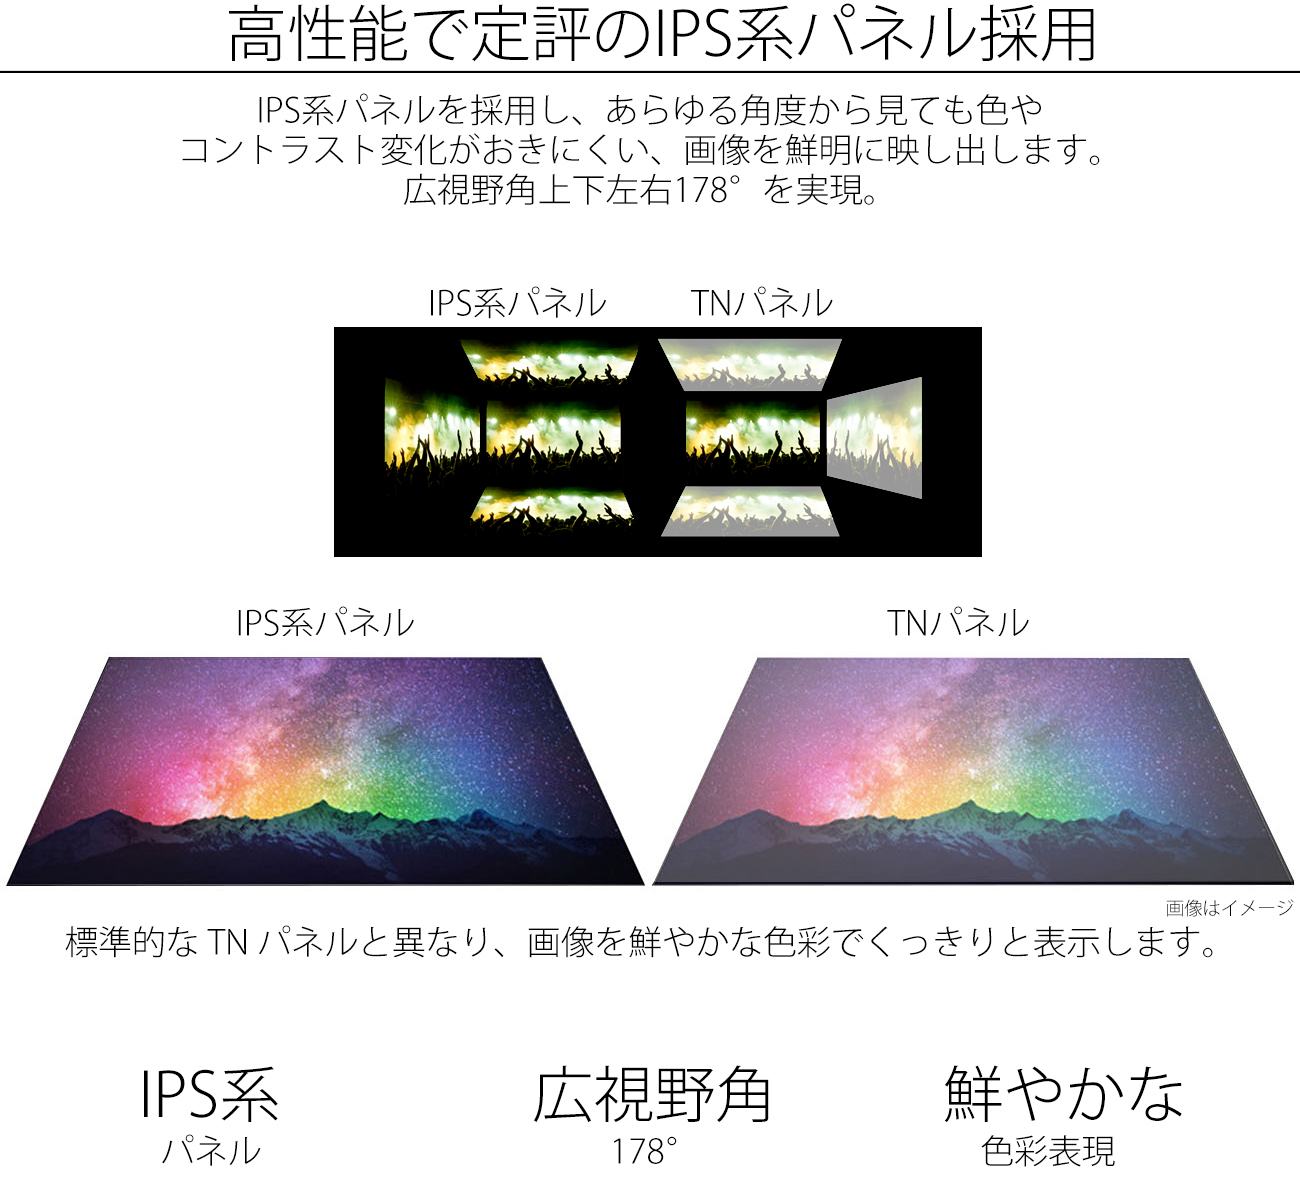 JN-T2880UHD freesync